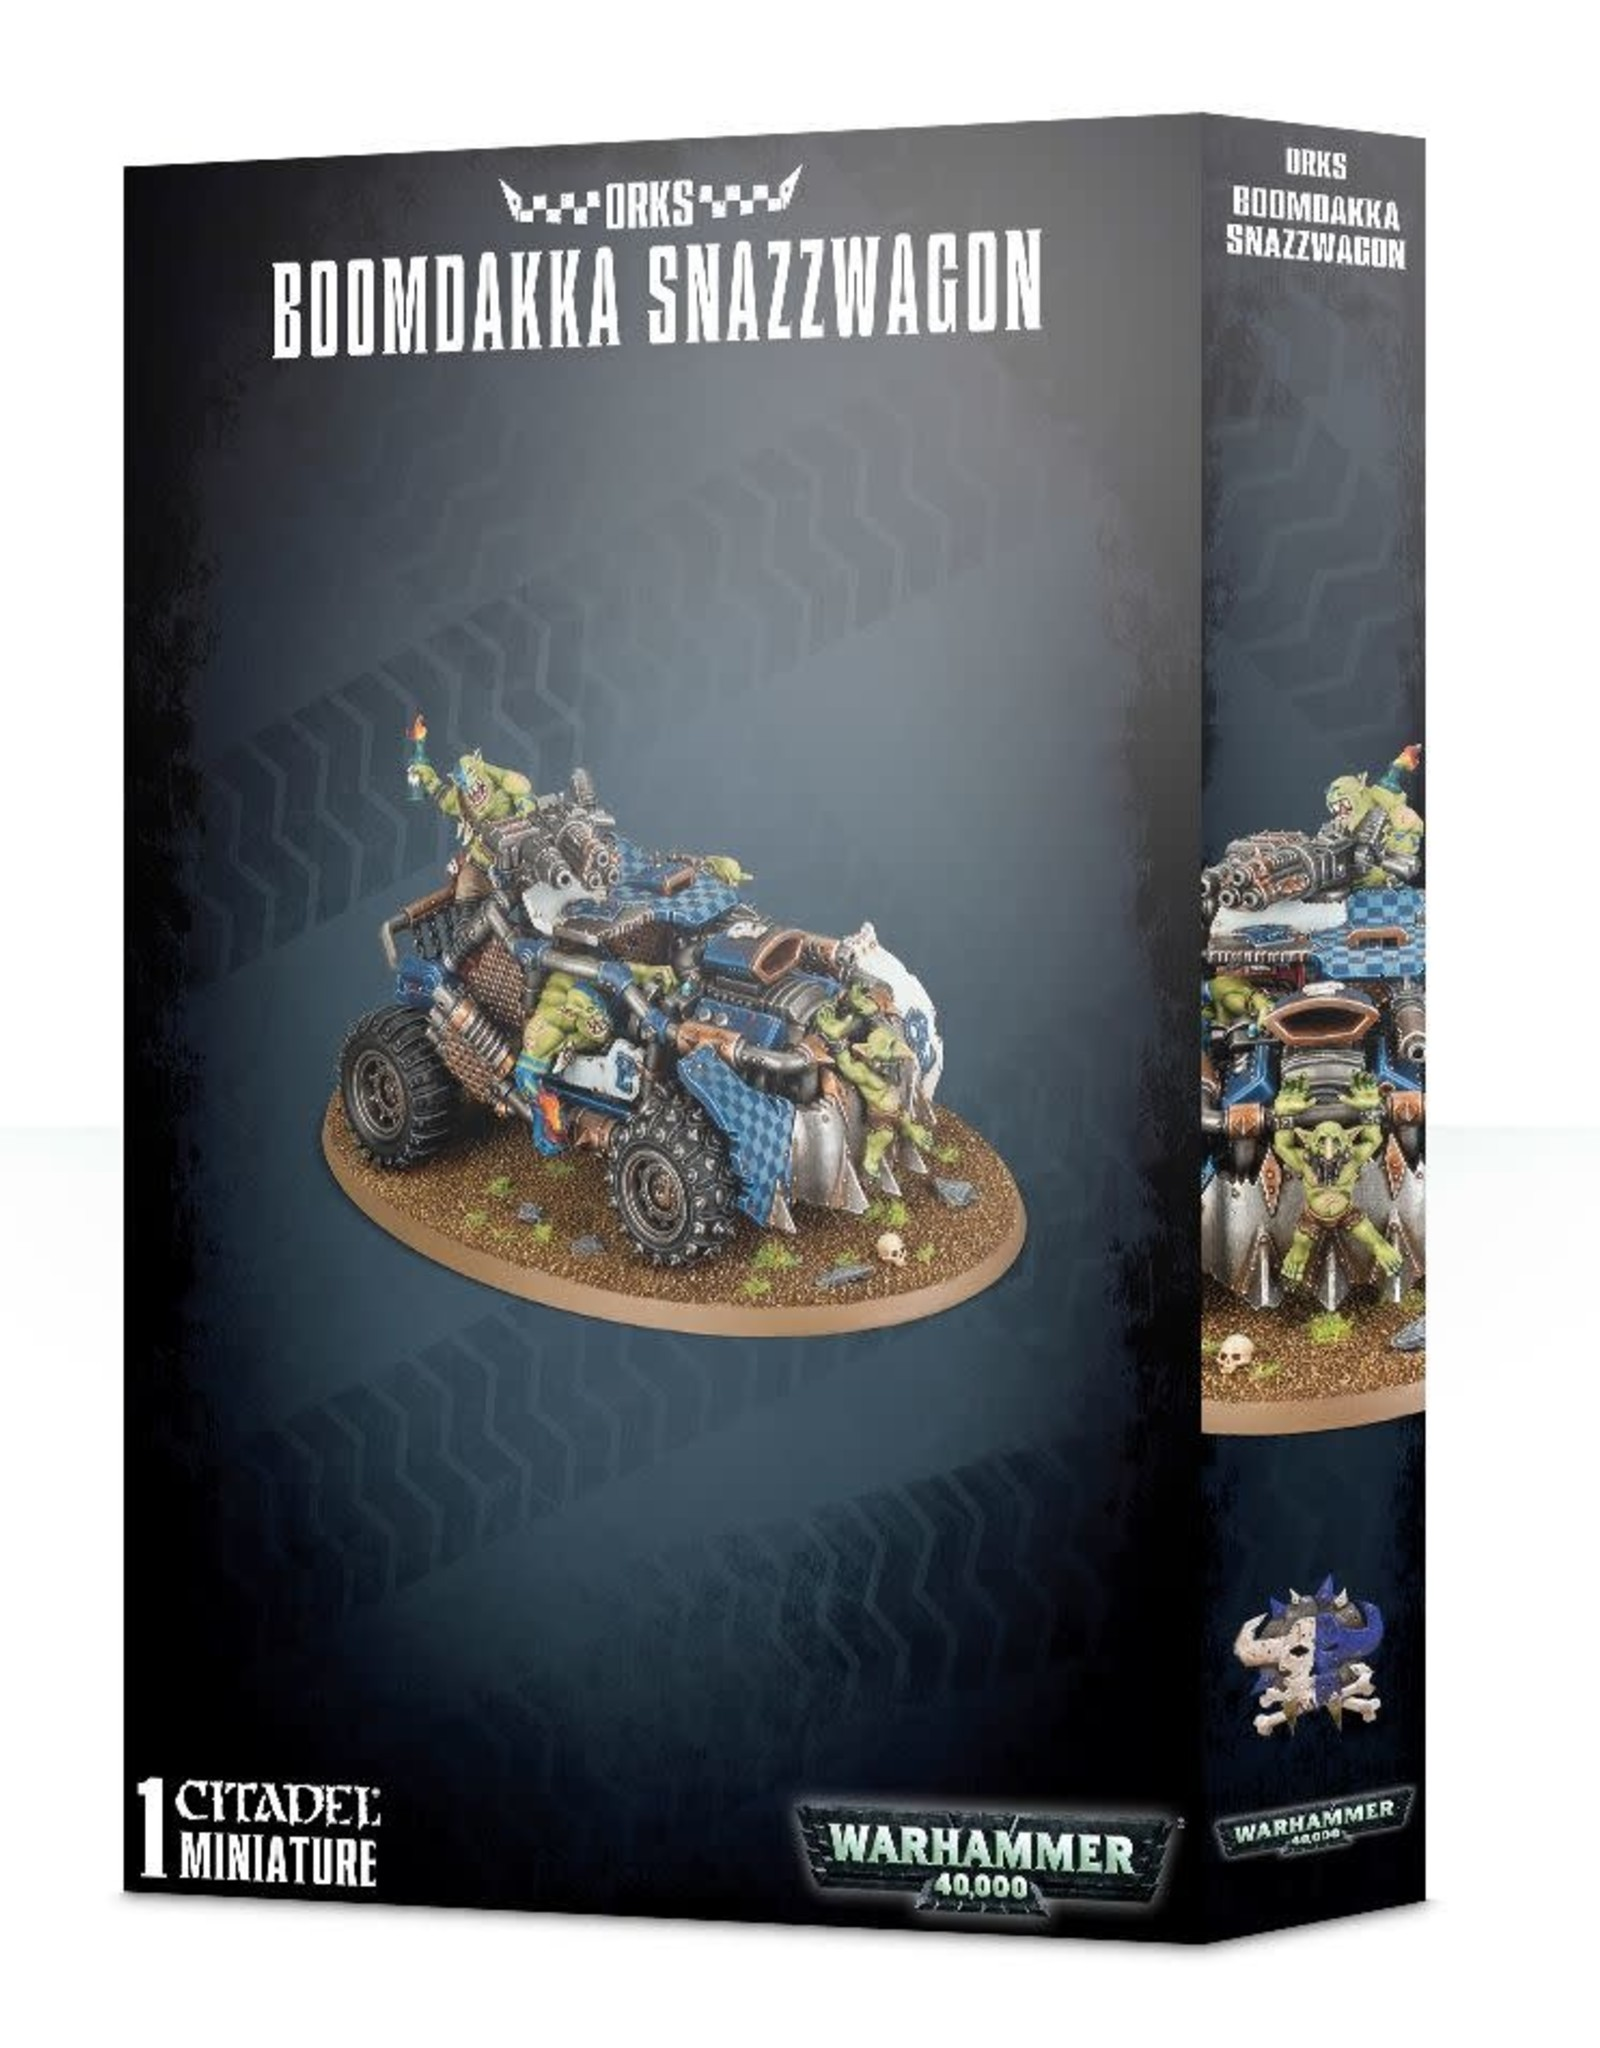 Warhammer 40K Orks Boomdakka Snazzwagon